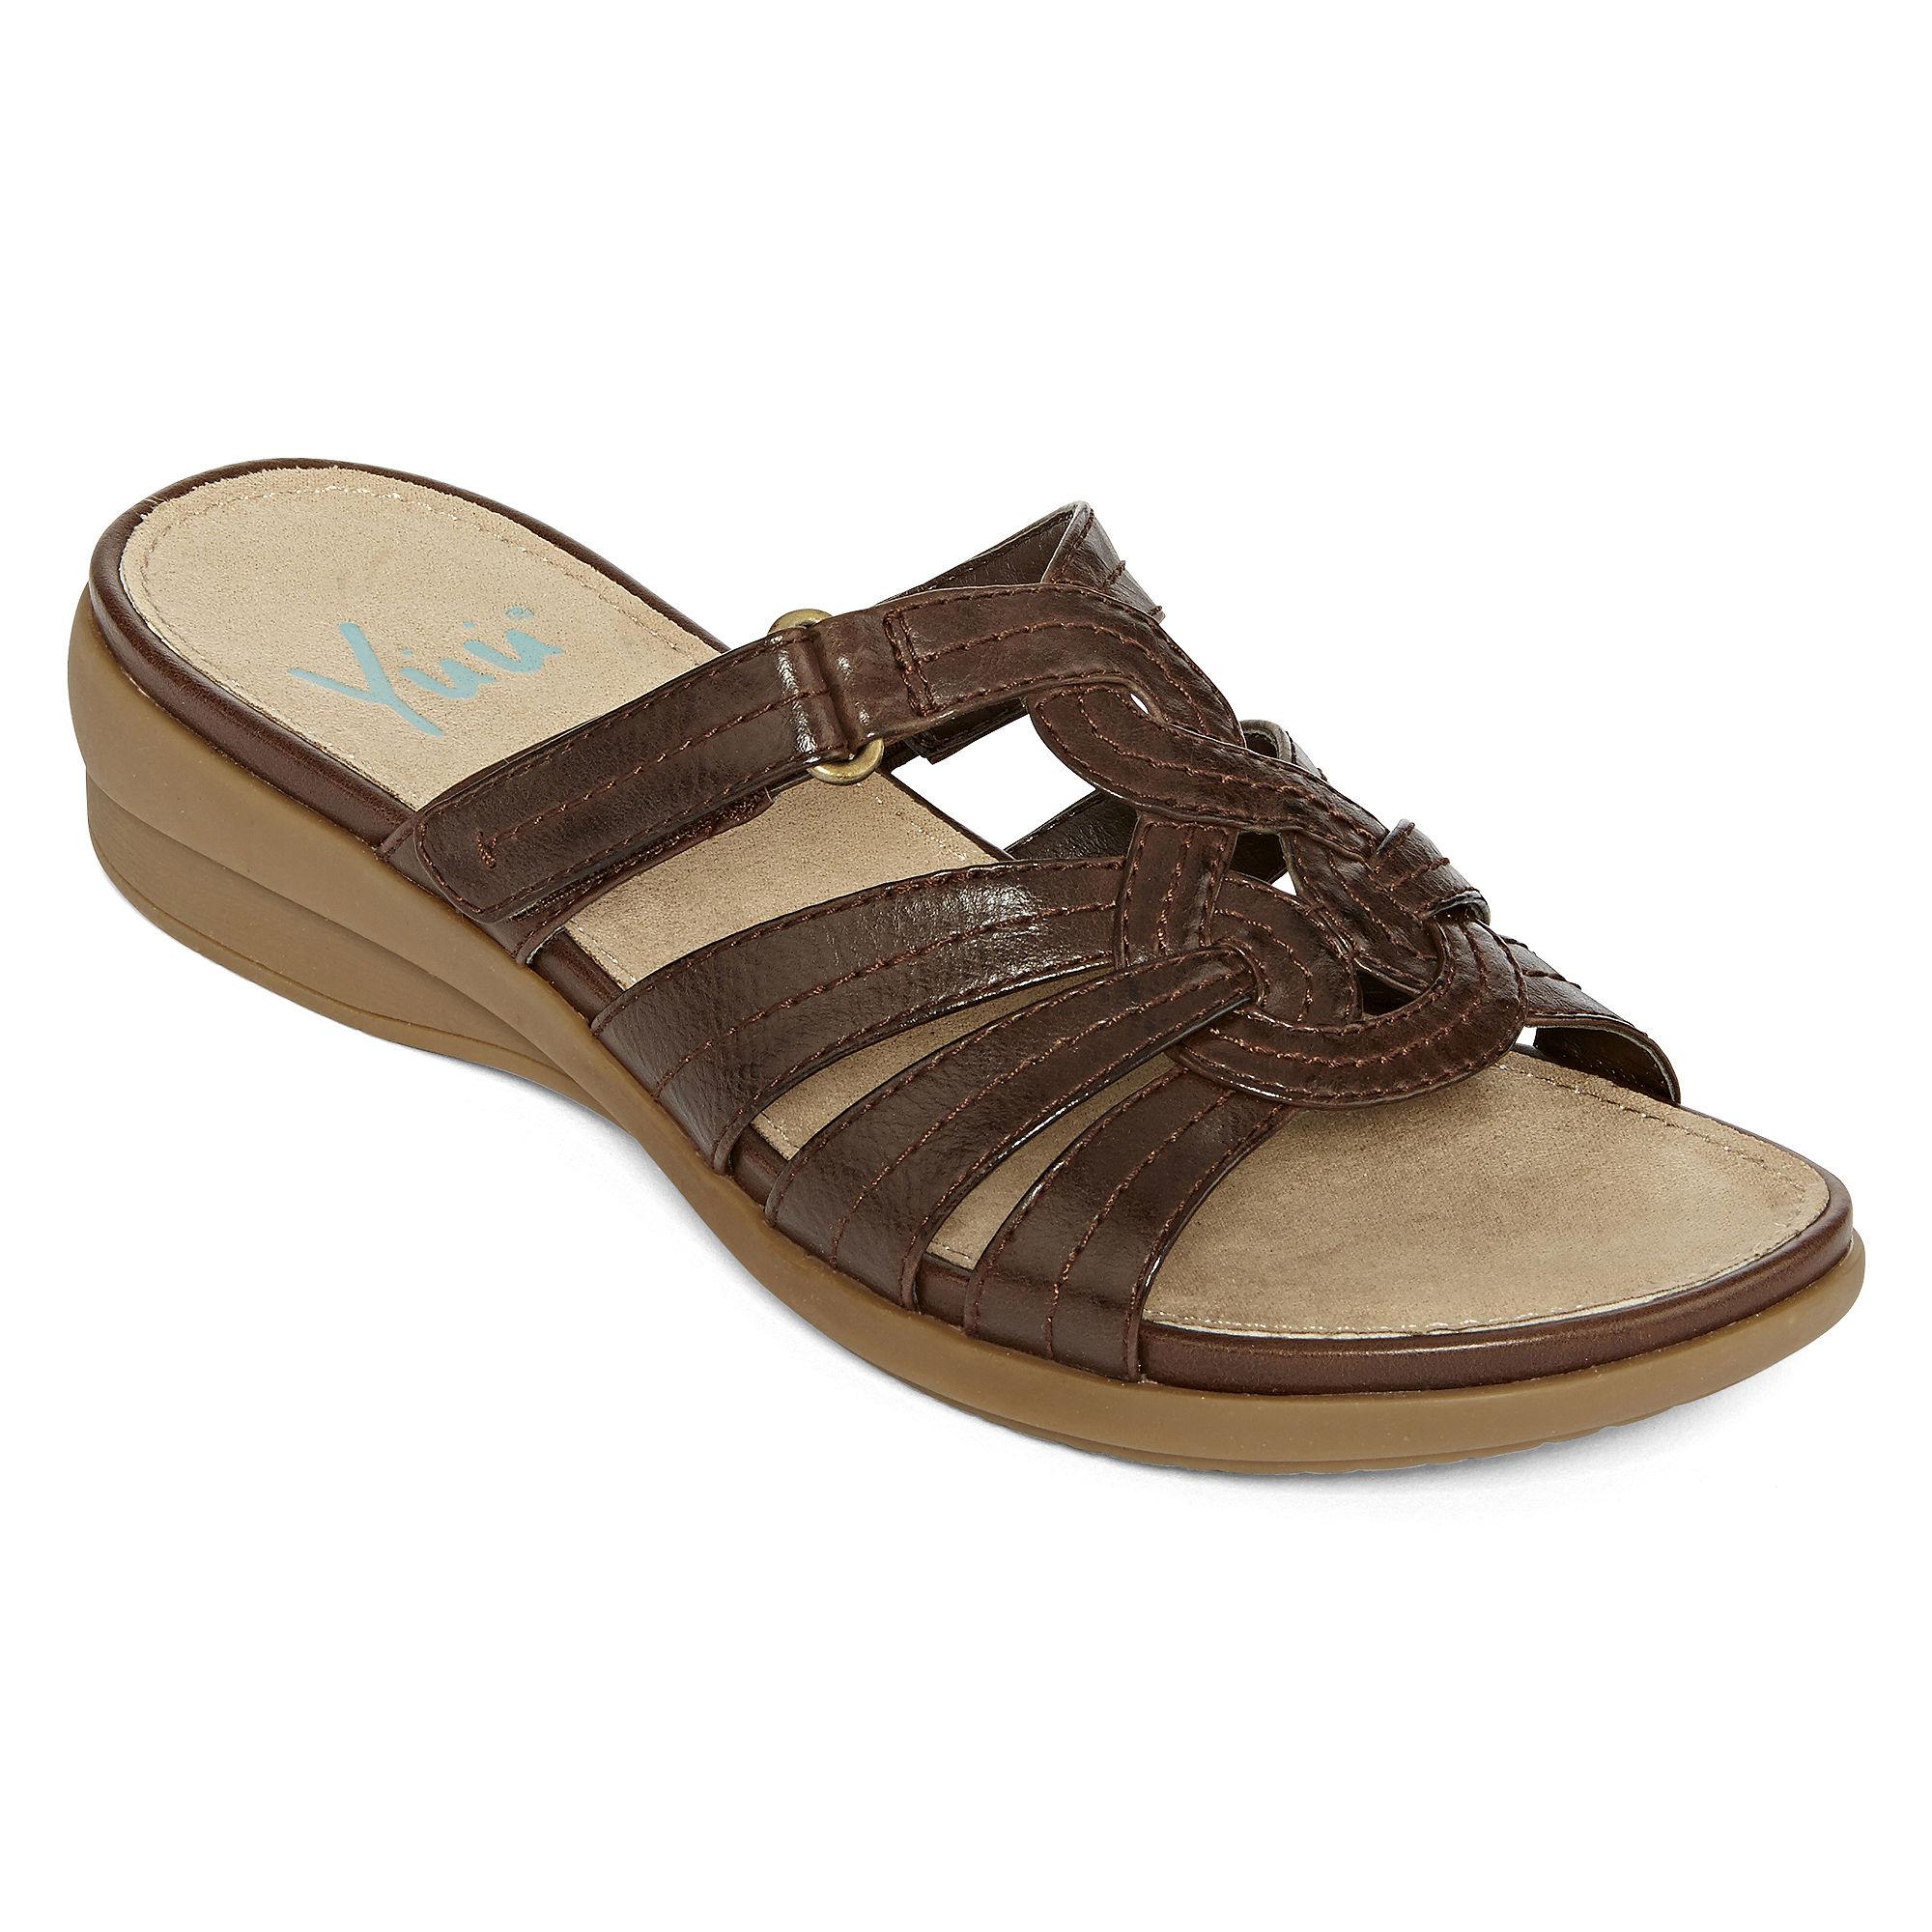 Upc 718987441807 Yuu Milley Slide Sandals Upcitemdb Com